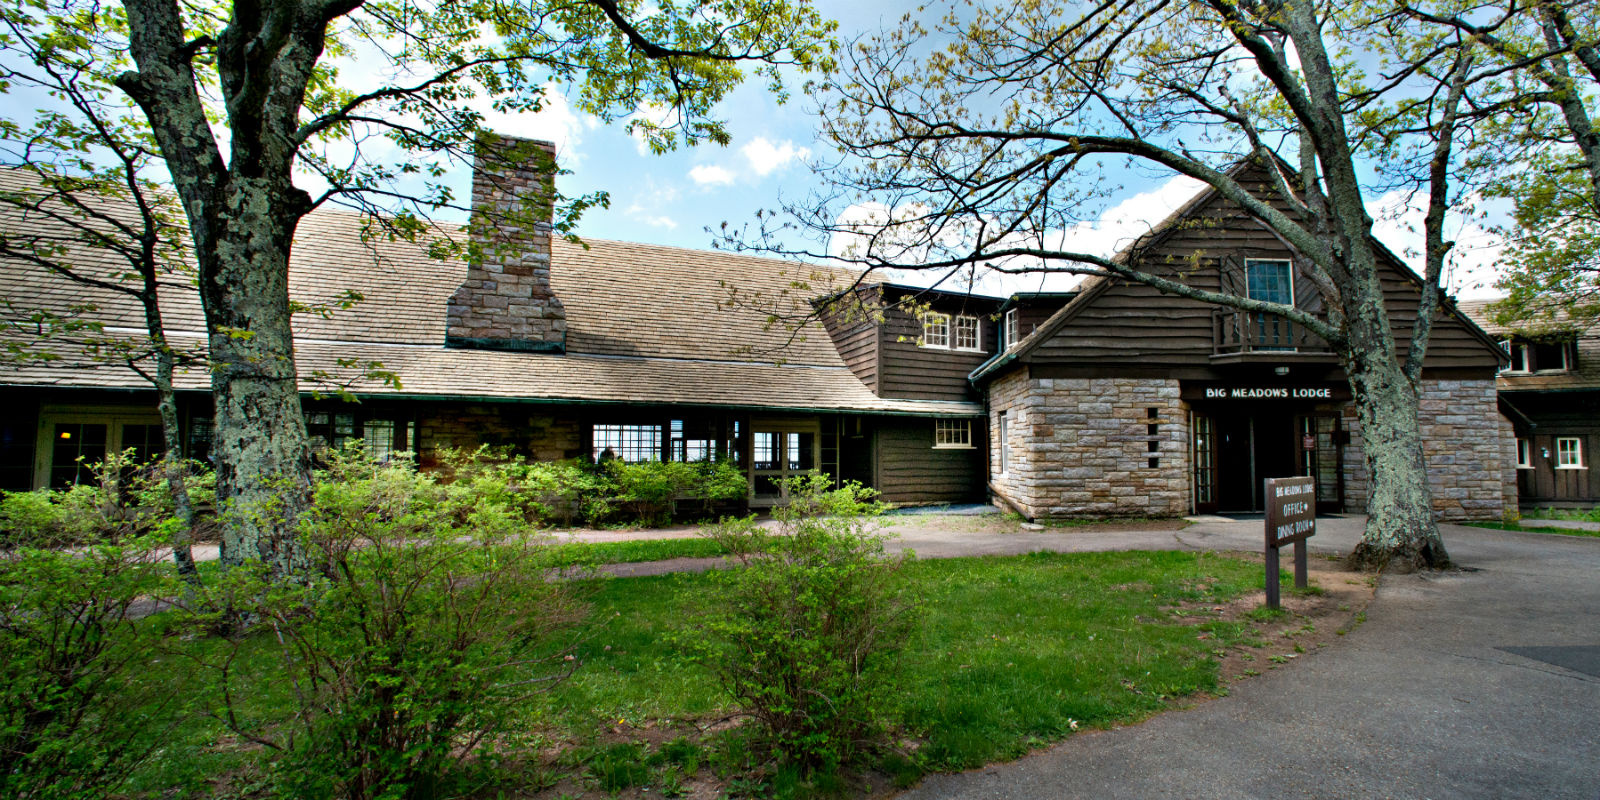 Big Meadows Lodge Shenandoah National Park, Page